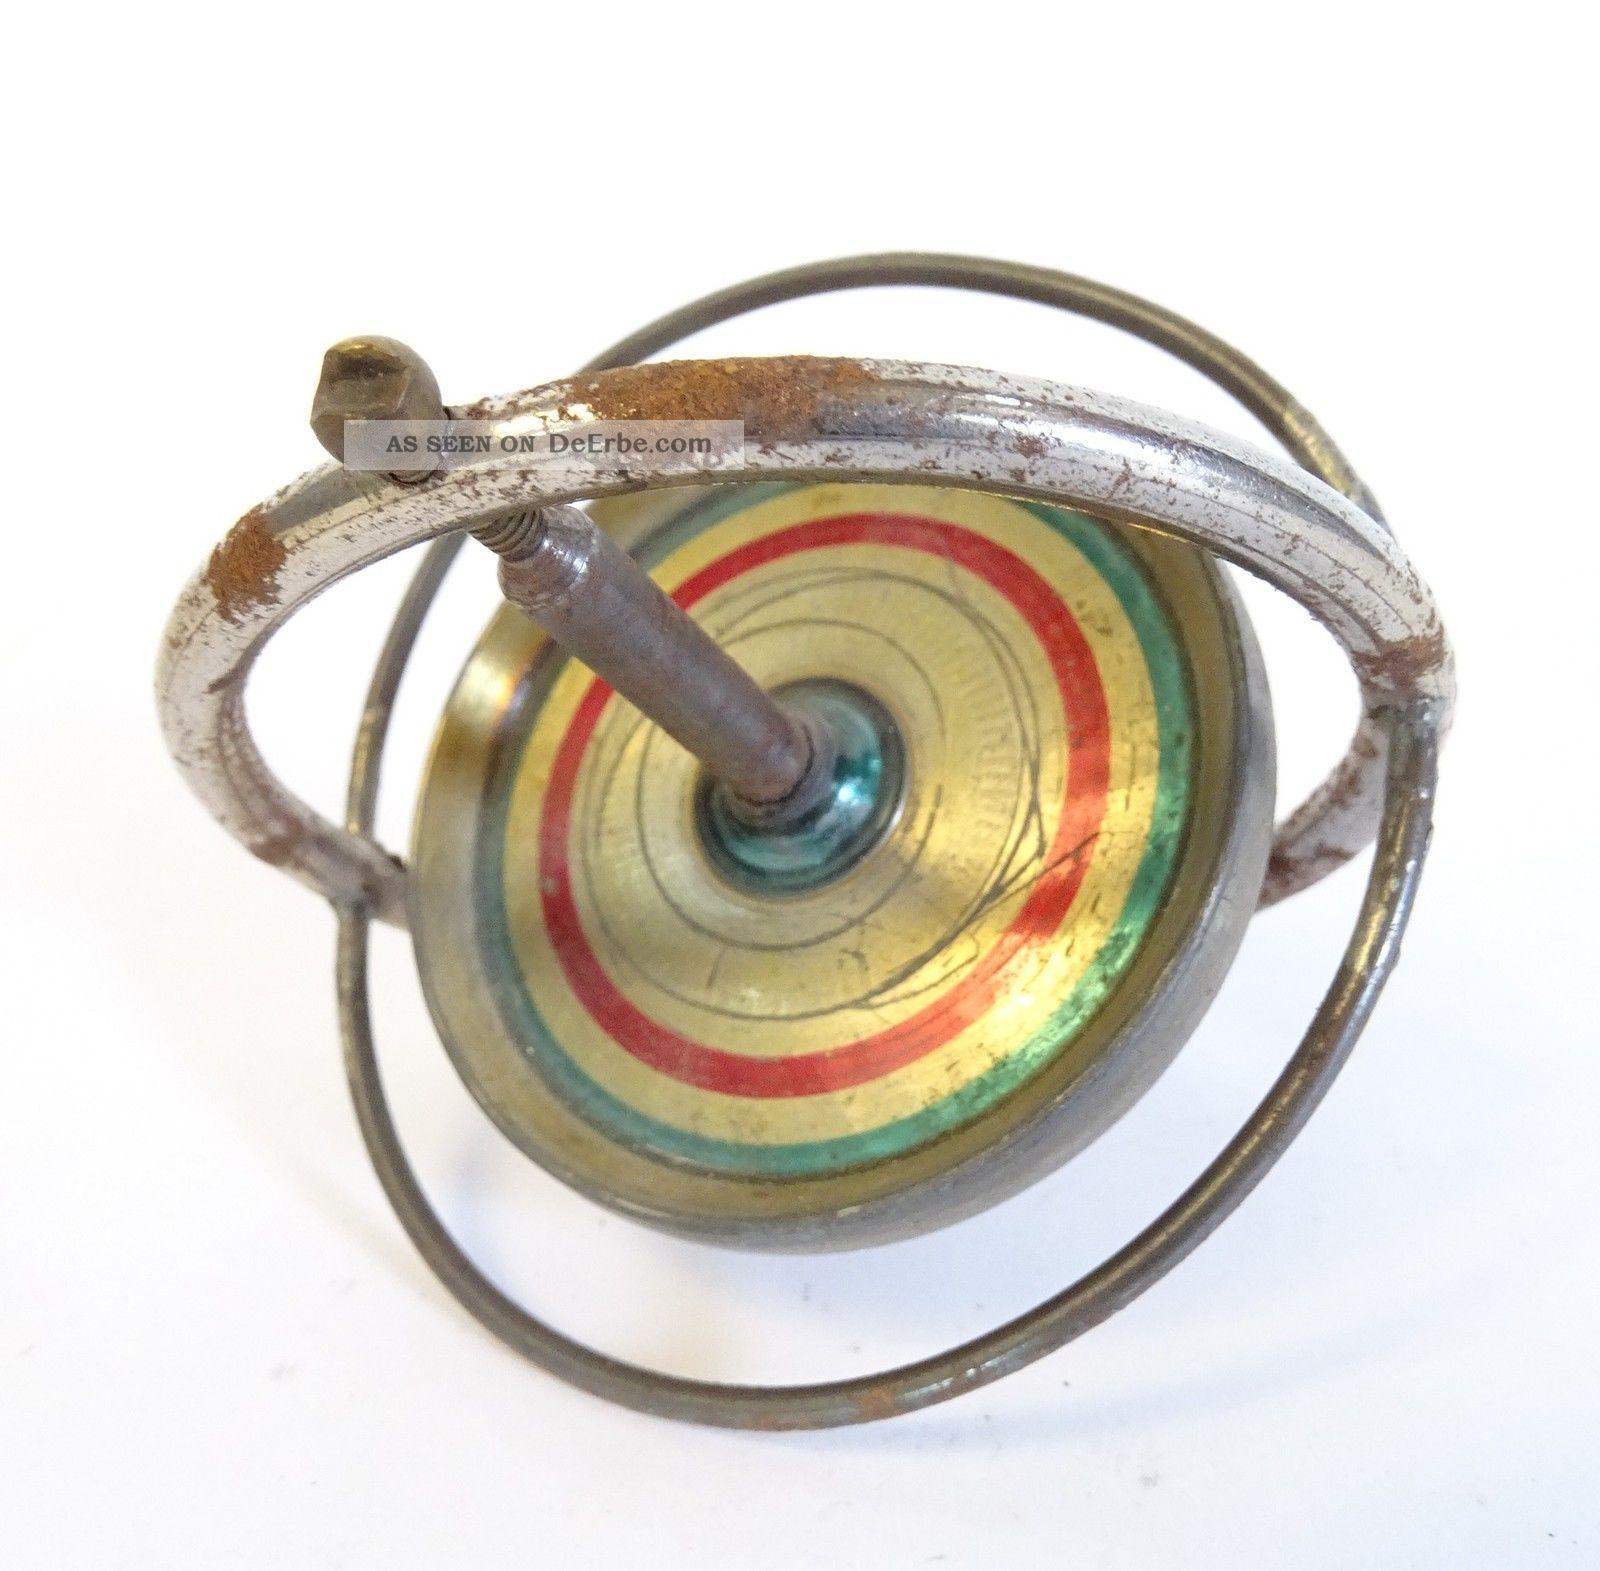 Antiker Kreisel Blechkreisel Gyroskop Physik Technik Antikspielzeug Rarität Original, gefertigt vor 1945 Bild